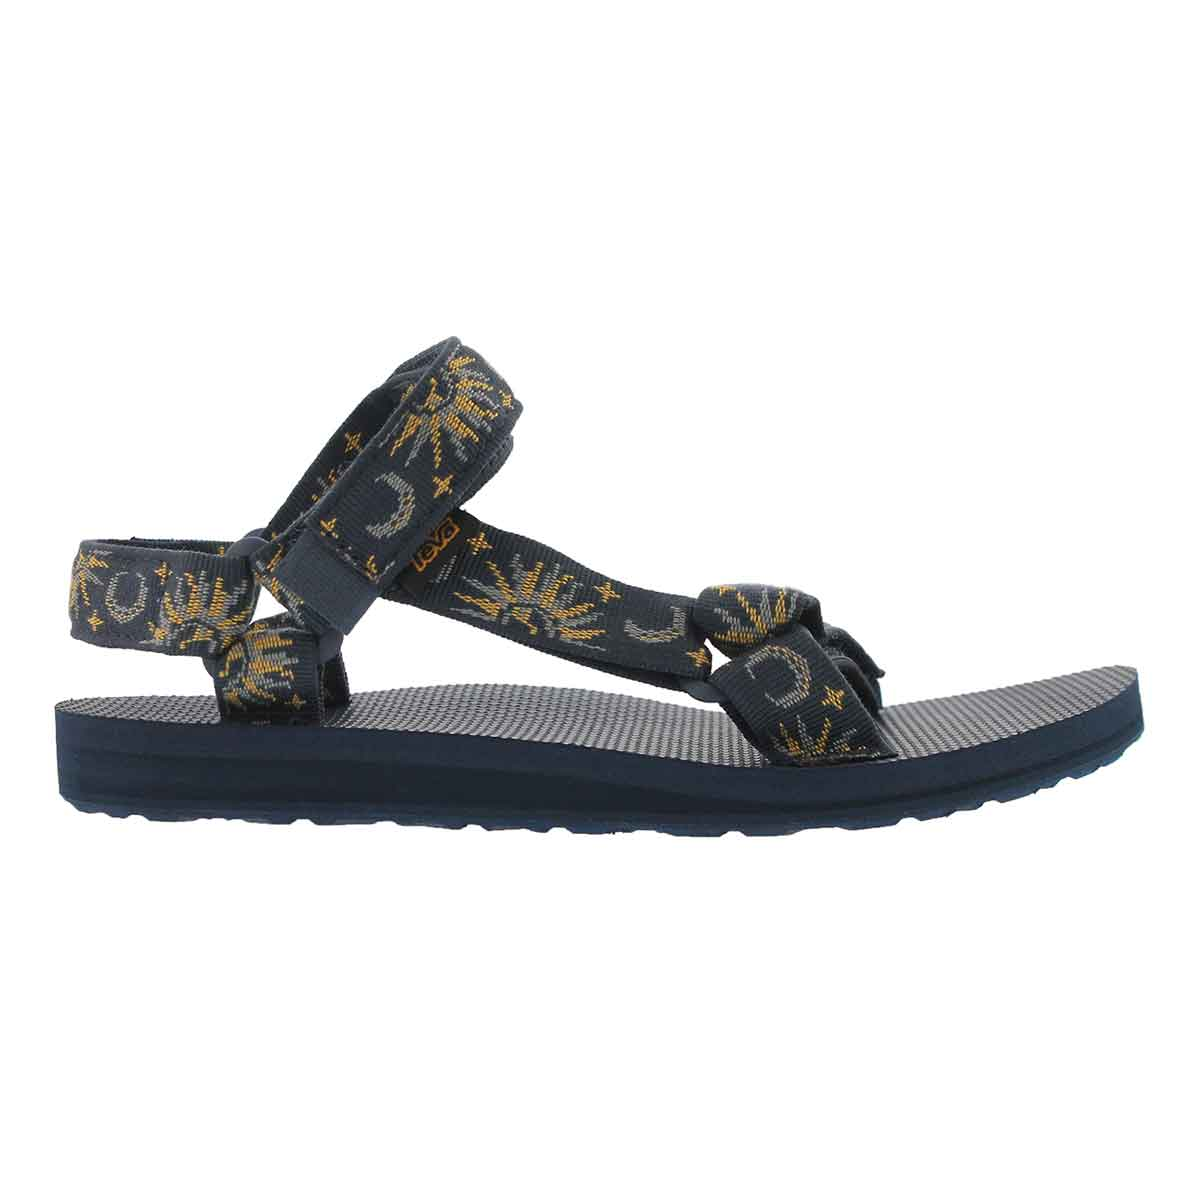 Lds Orig Universal sun/moon sport sandal